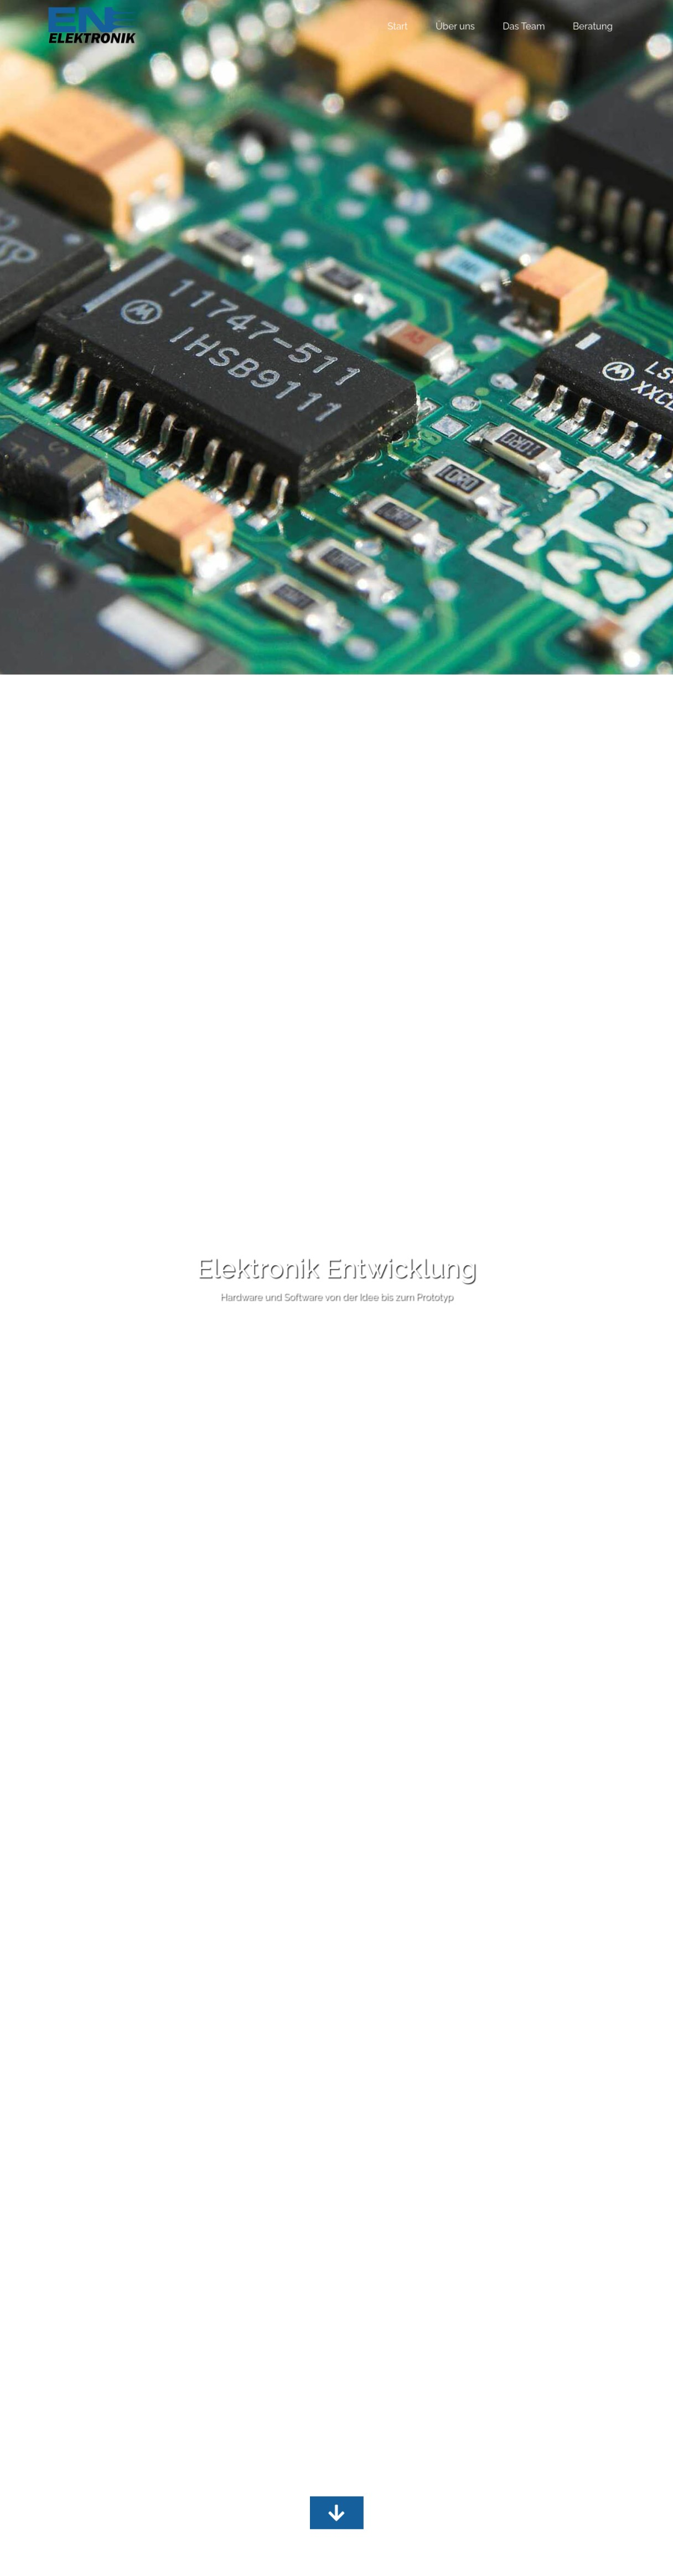 EN-Elektronik - Layout, Schaltplan, Prototyp, Software, Offenburg